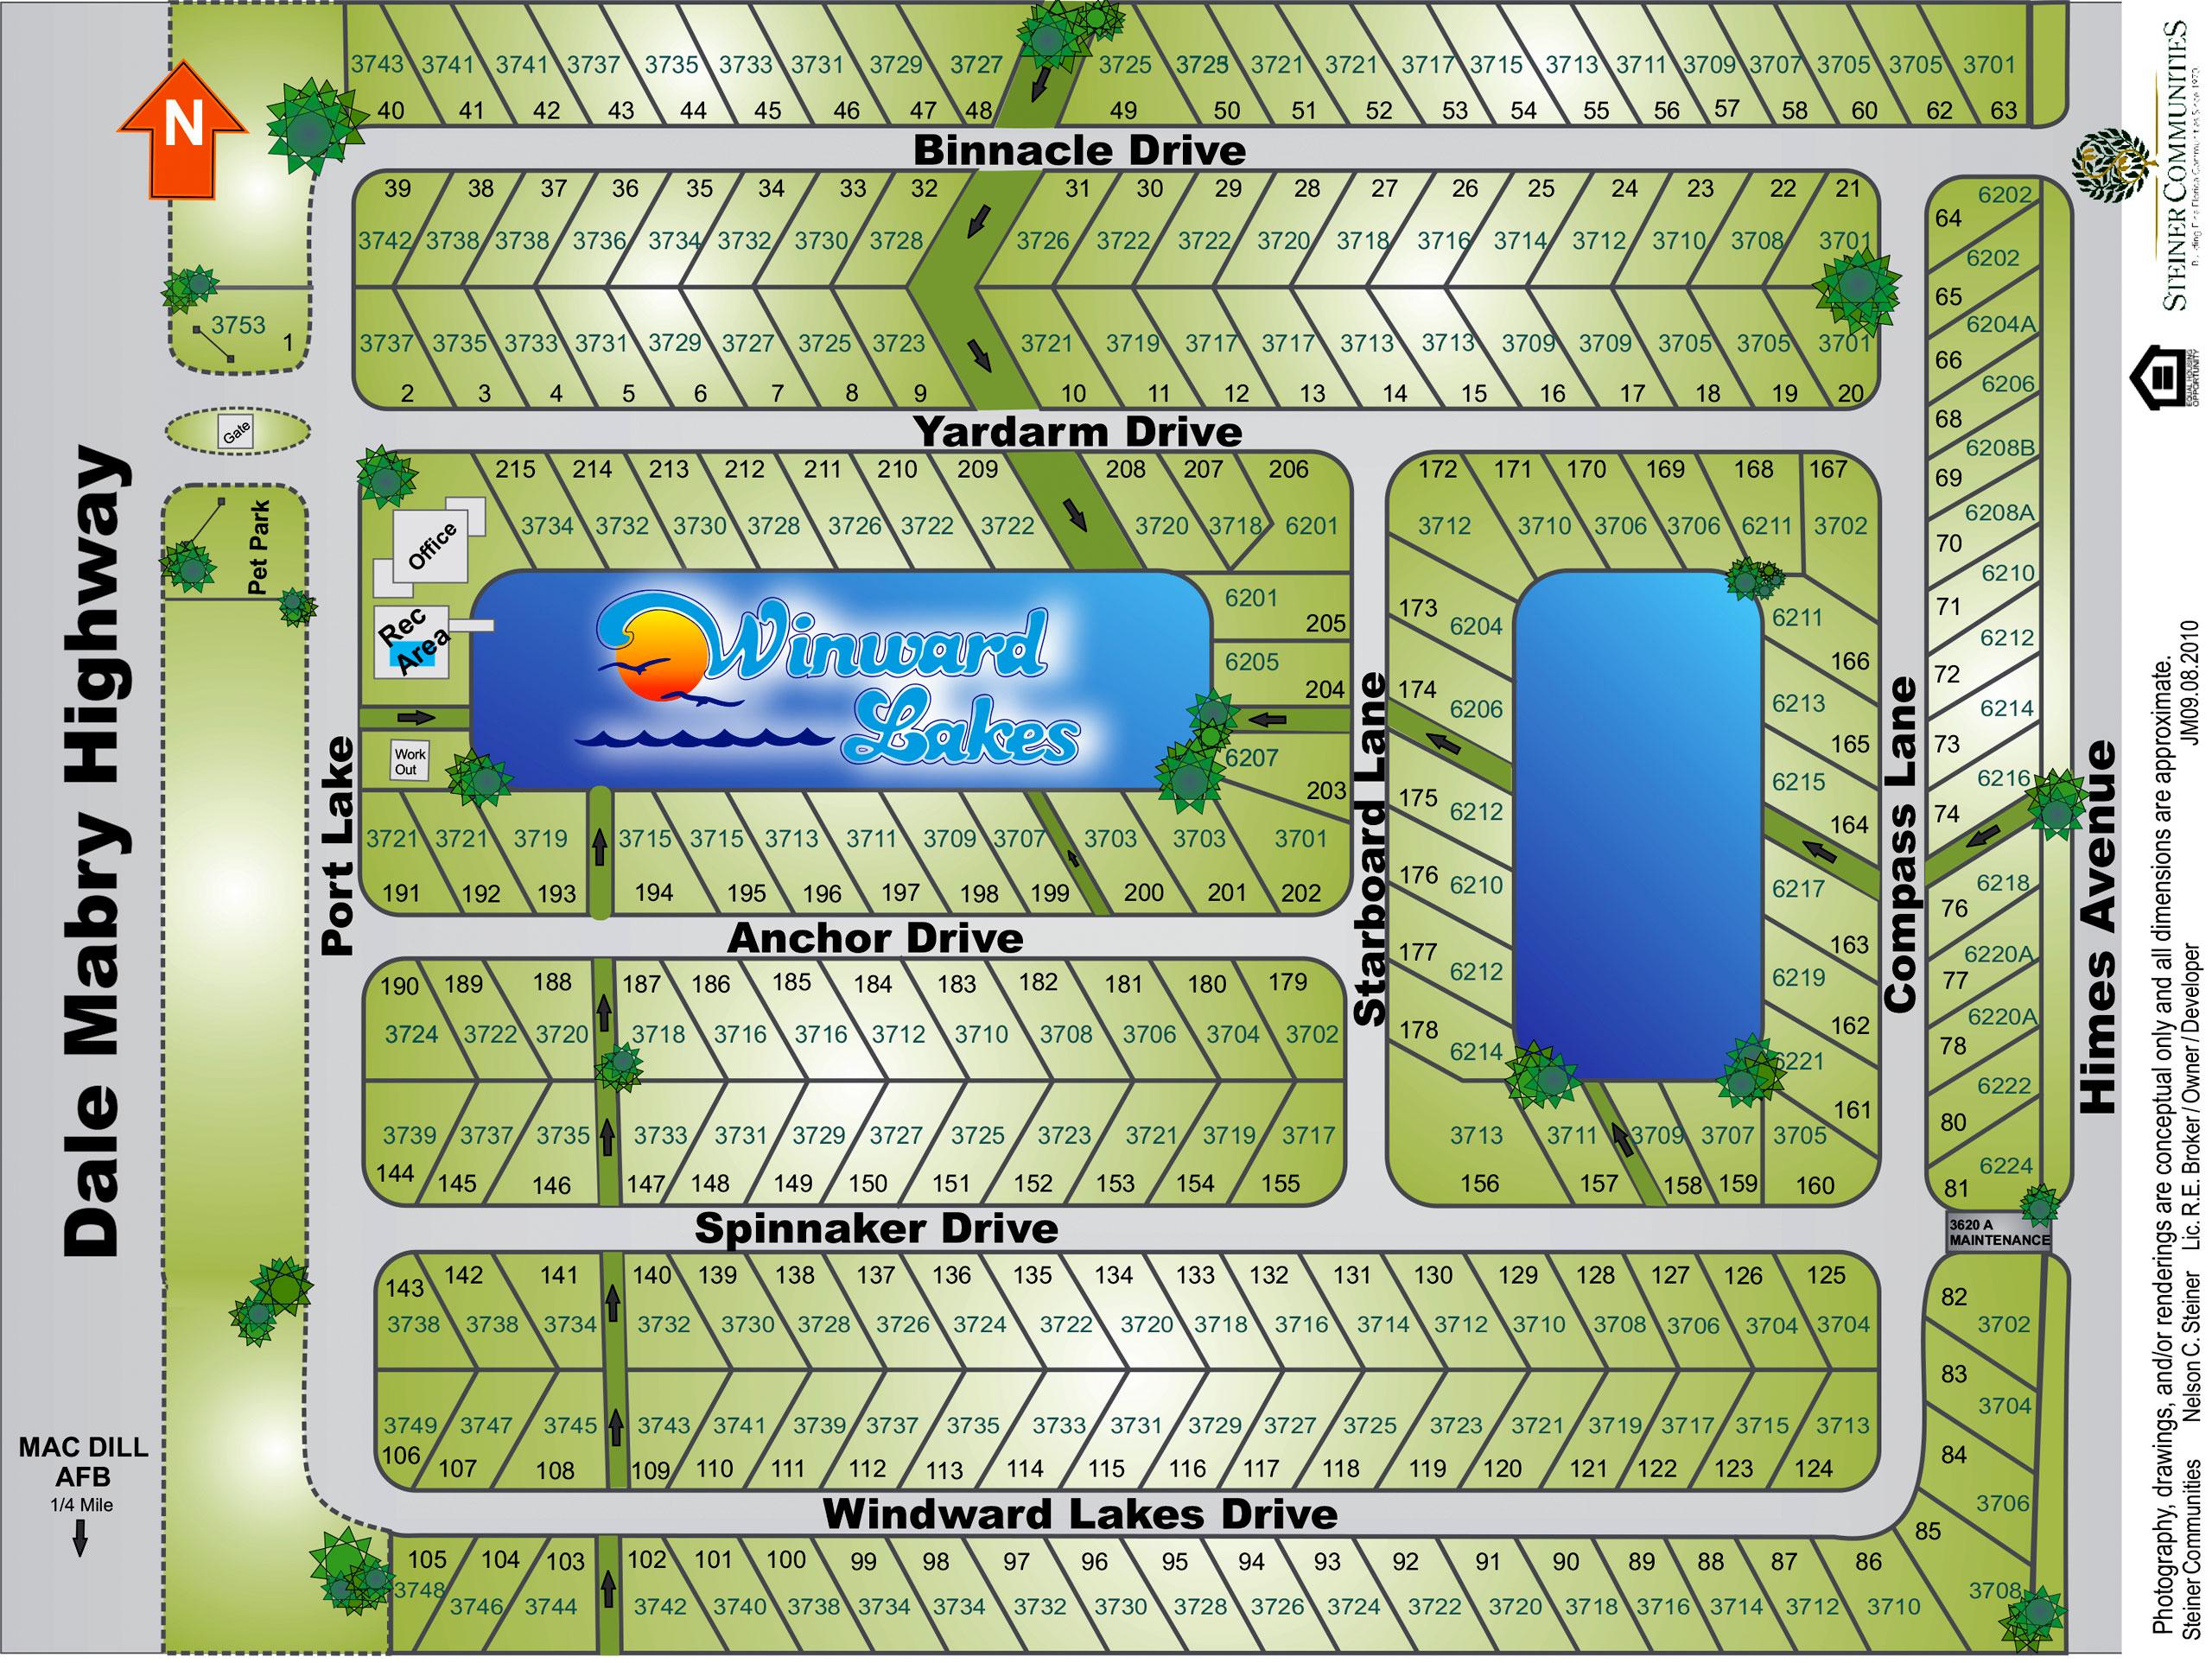 Winward Comminity Map Image